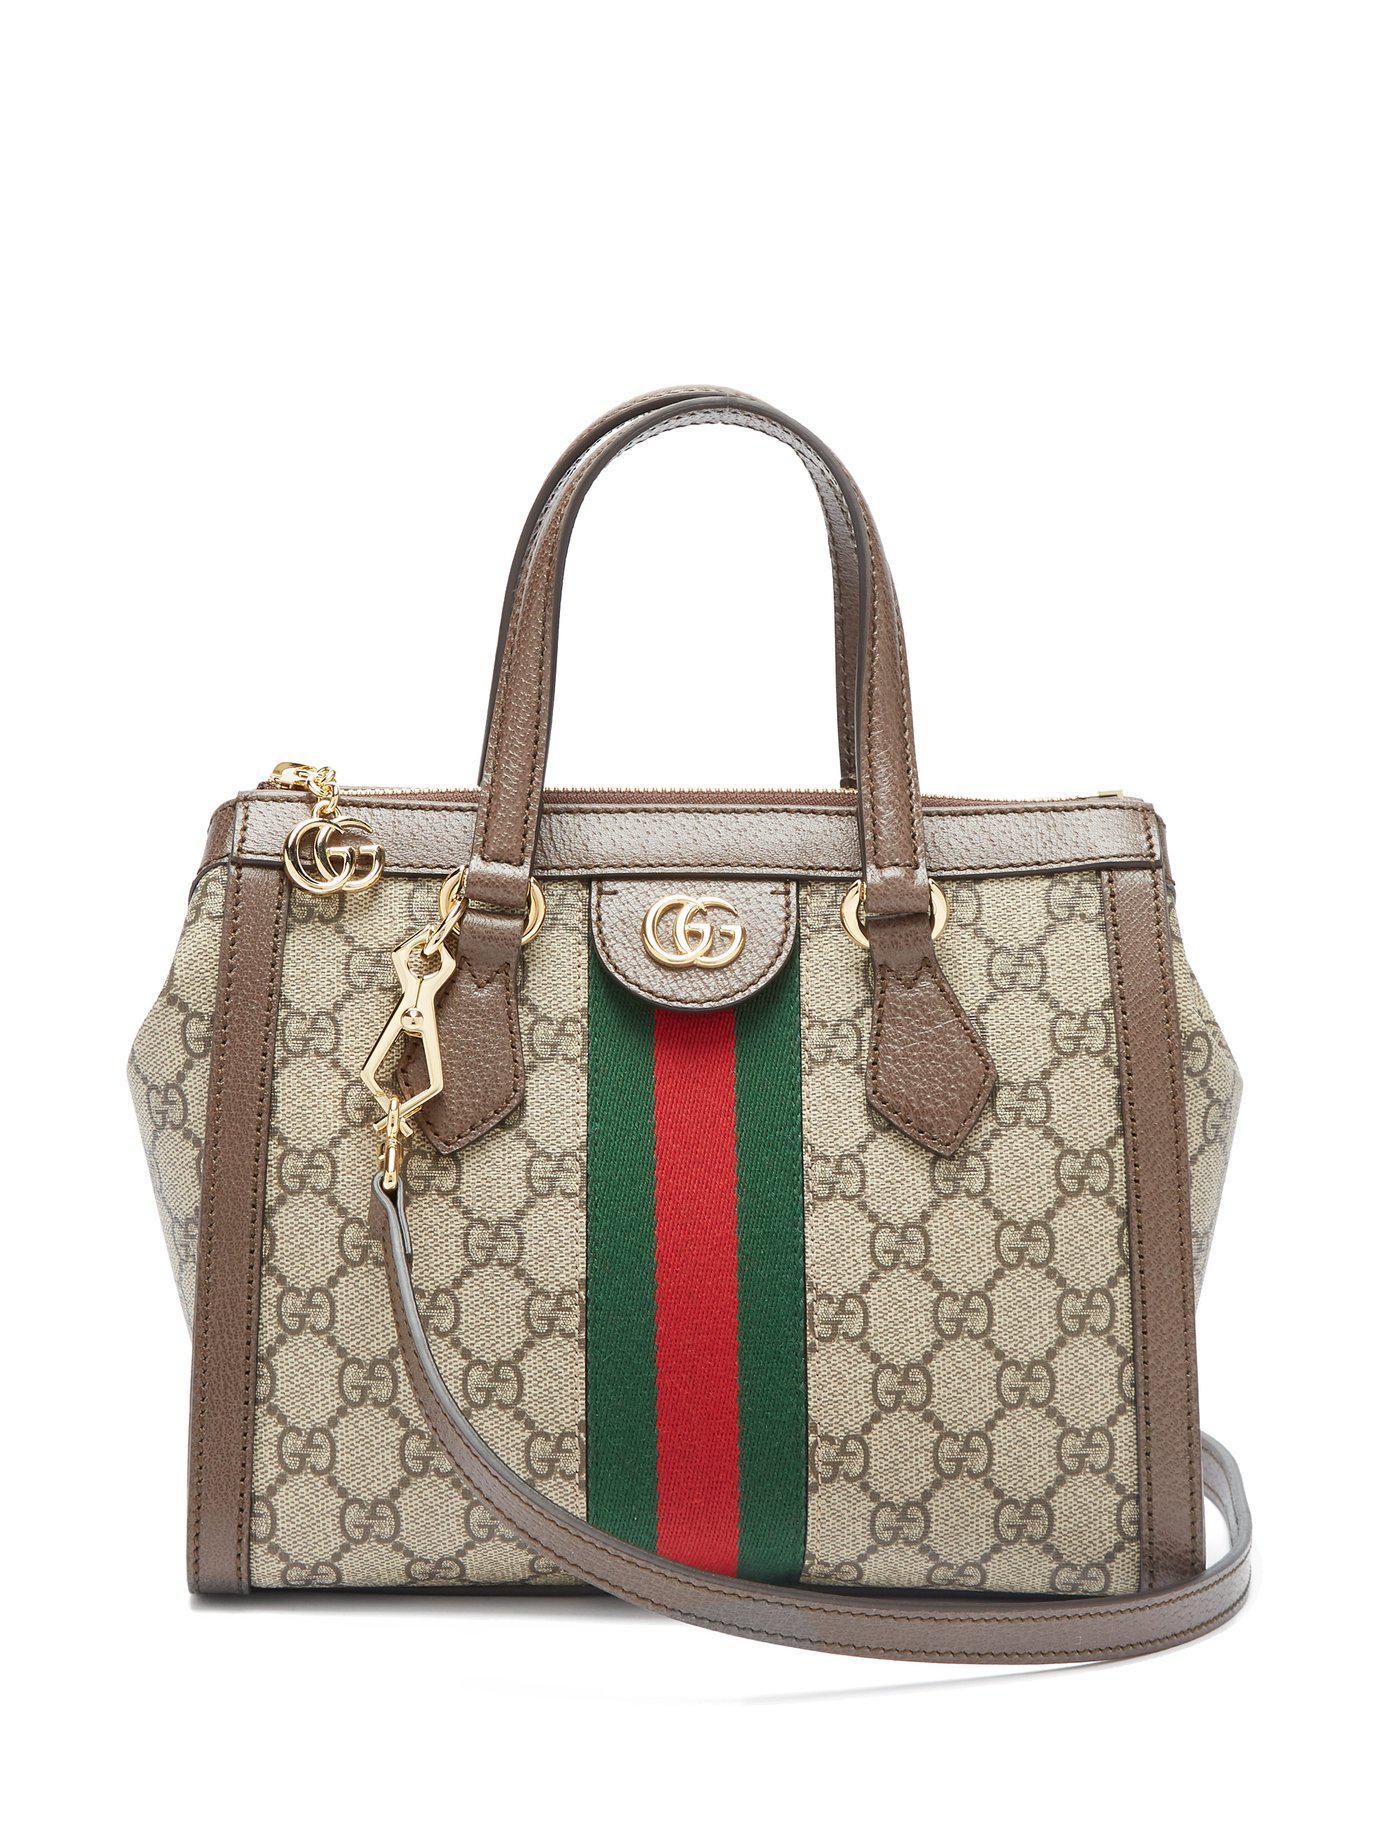 91f6262c6f0 Lyst - Gucci Ophidia Gg Supreme Canvas Cross Body Bag in Gray